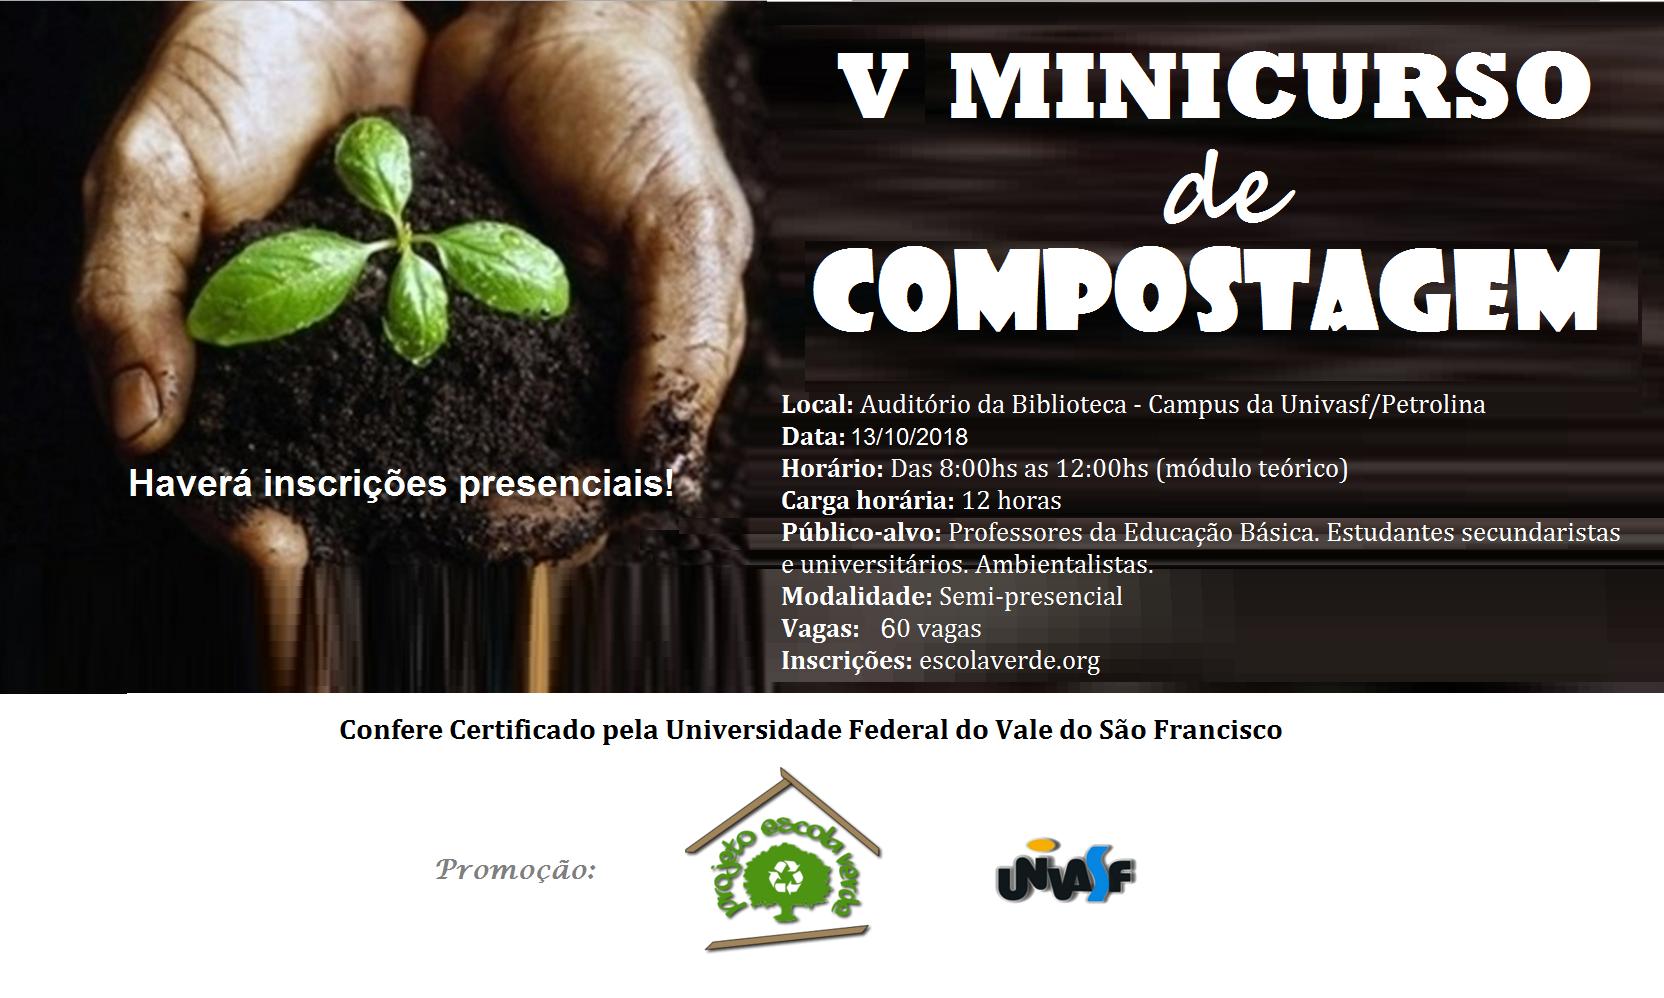 banner III minicurso de compostagem